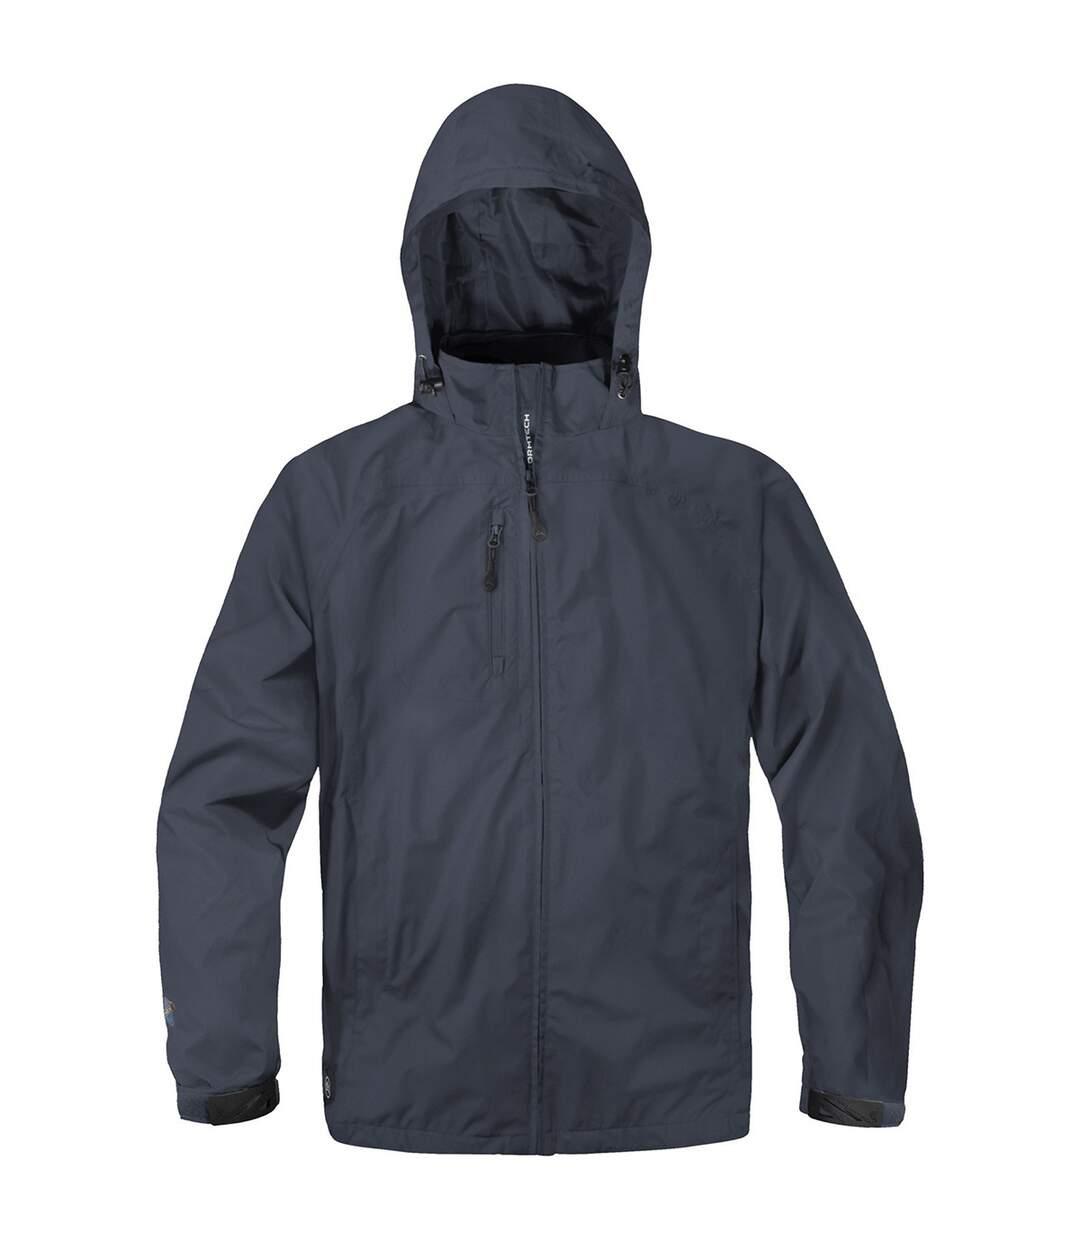 Stormtech Mens Stratus Light Shell Jacket (Waterproof & Breathable) (Navy Blue) - UTBC2082